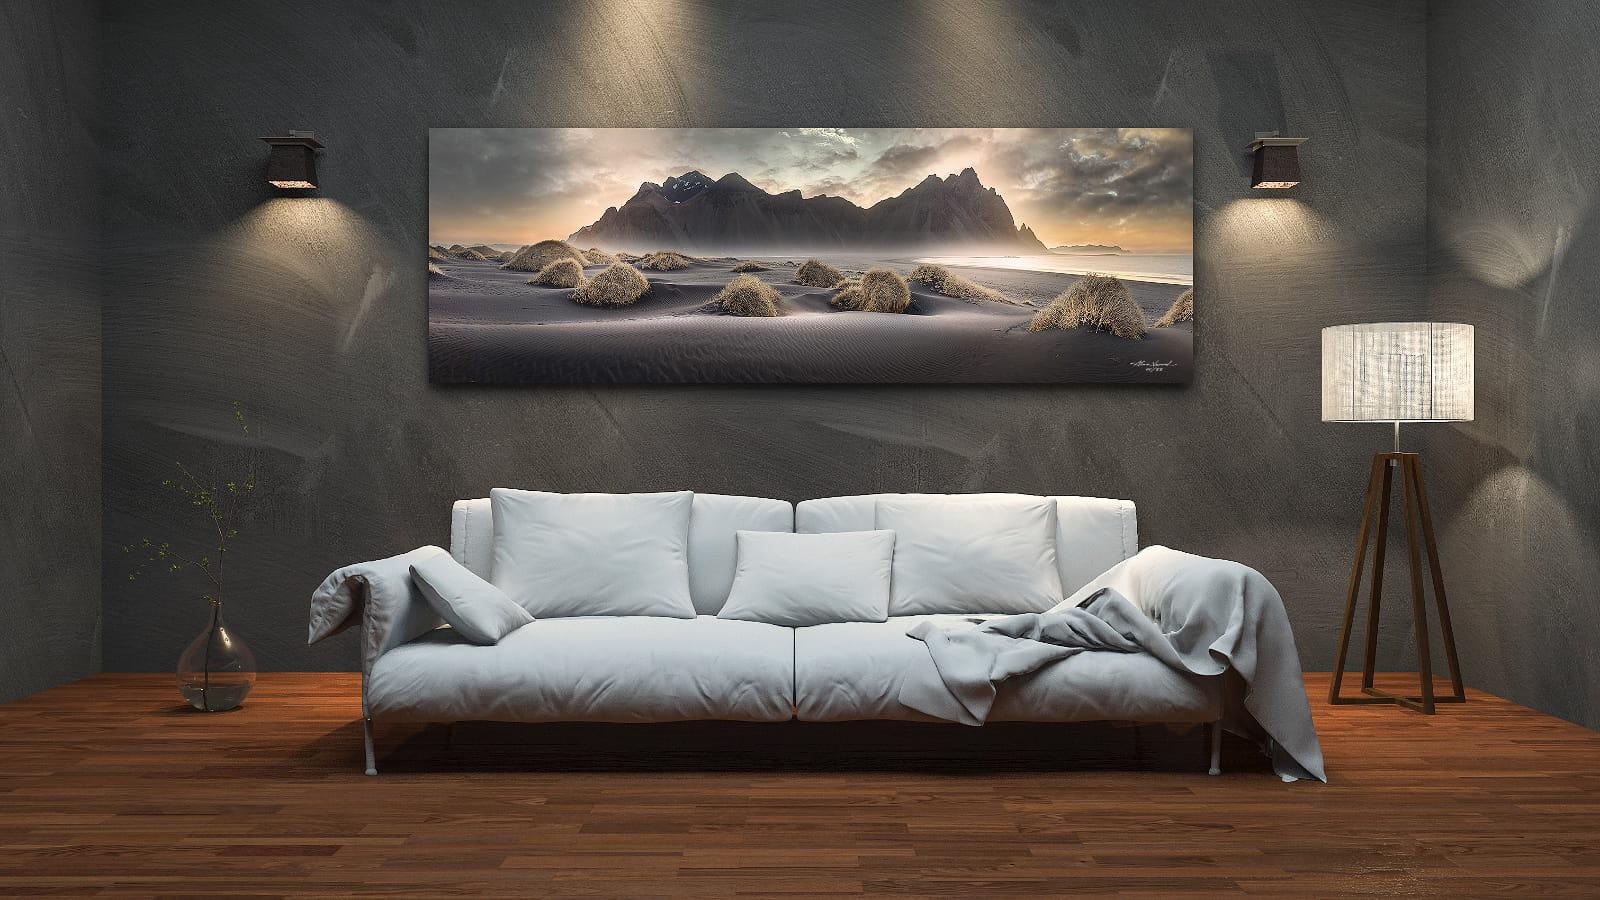 Alexander Vershinin, Luxury, Fine Art, Interior Design photo